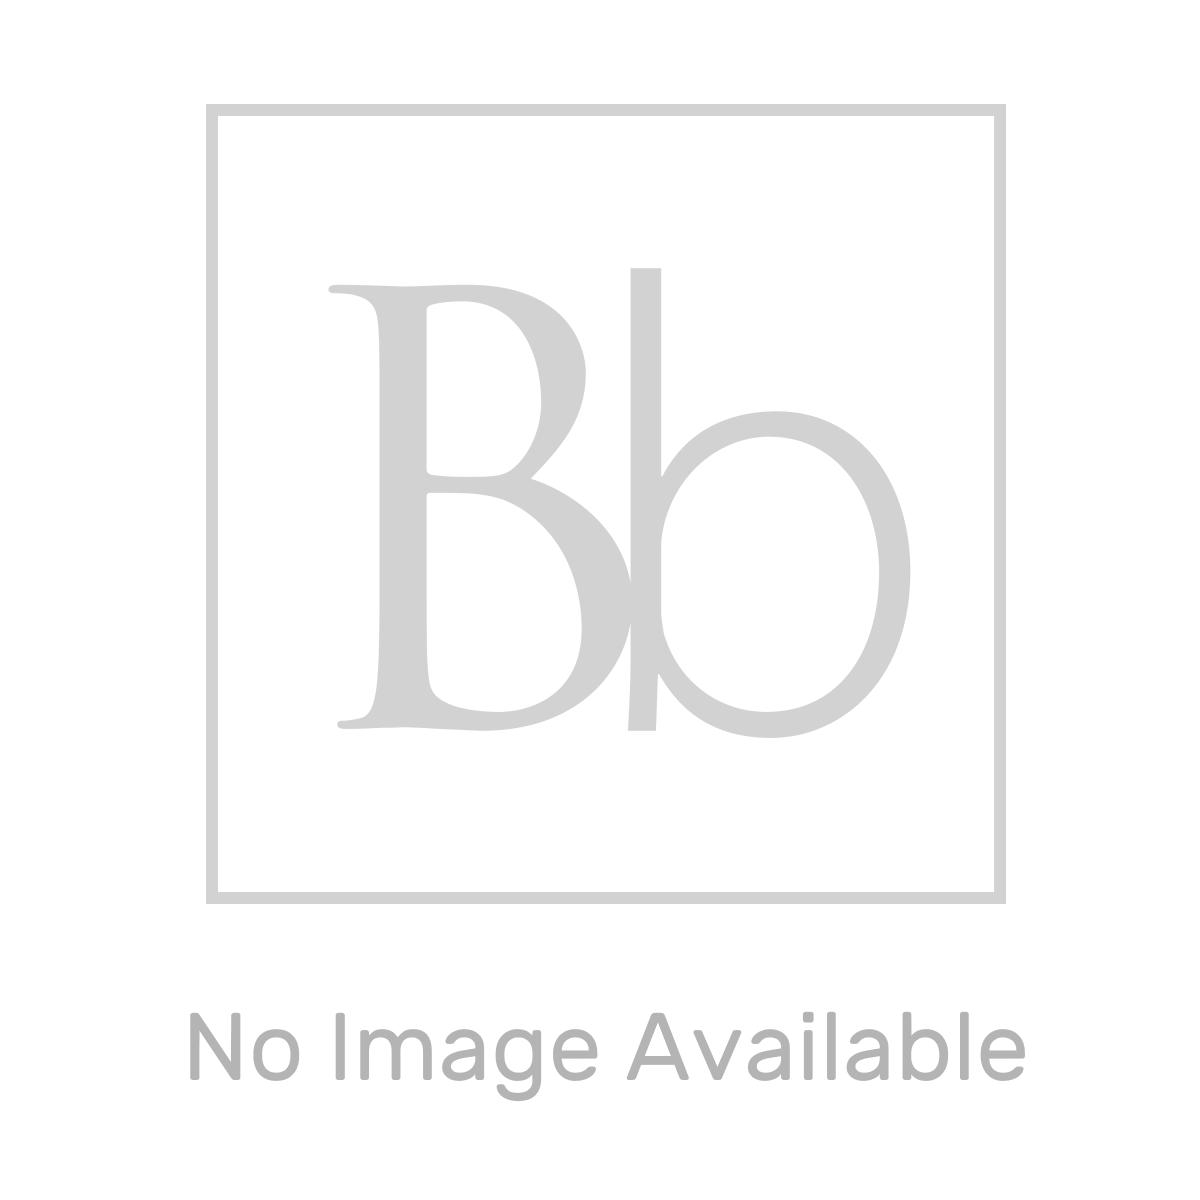 Aquadart White Slate Shower Tray 1700 x 700 Dimension